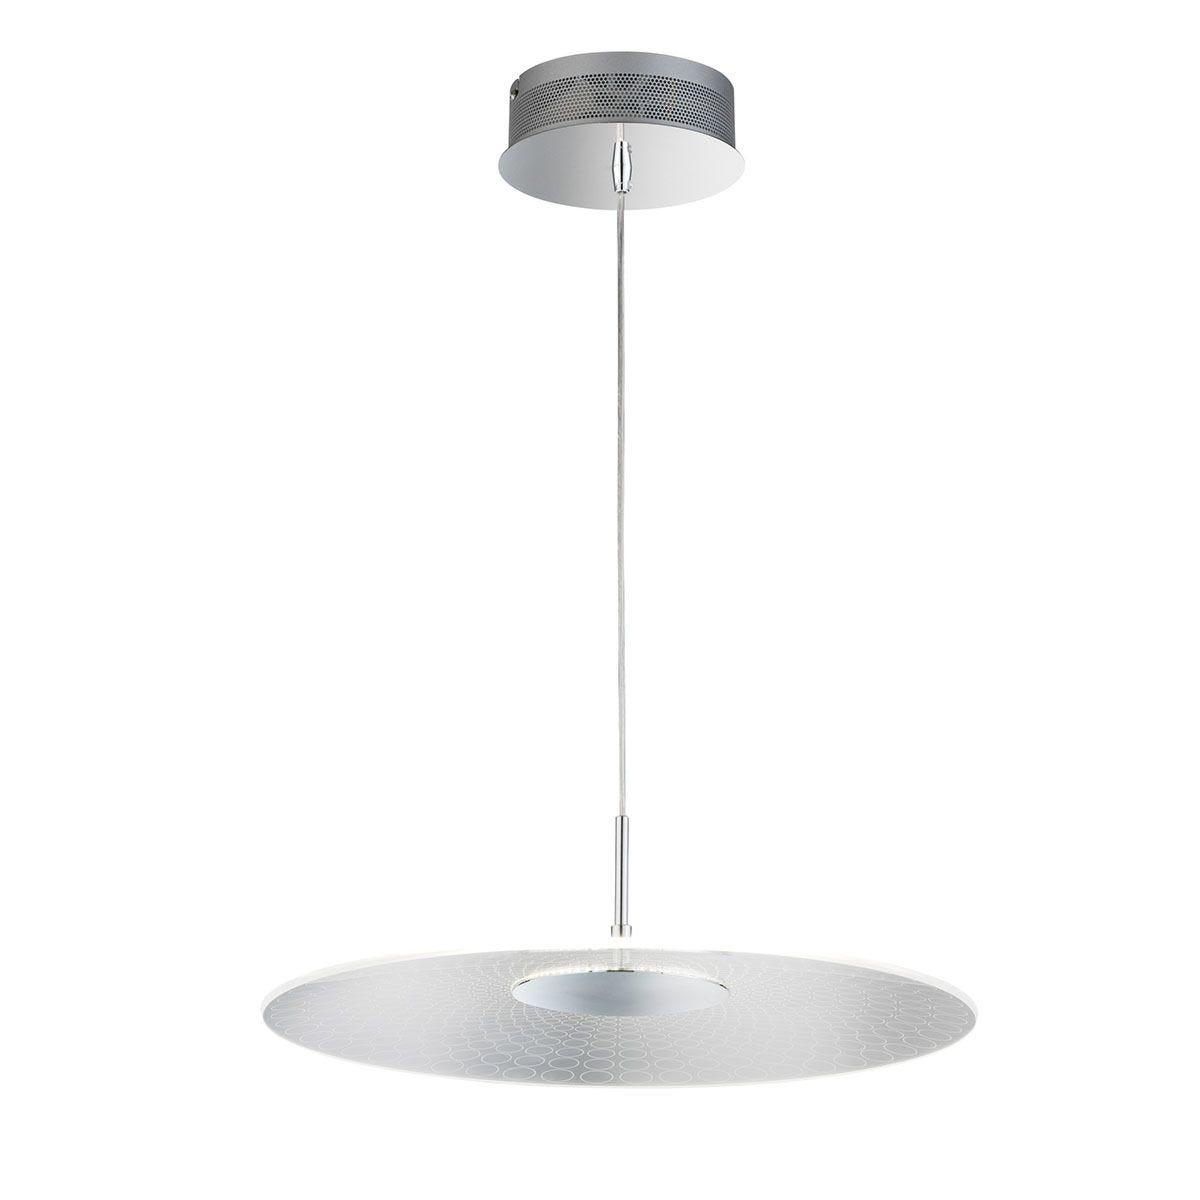 Wofi Coco LED Pendant Light - Chrome